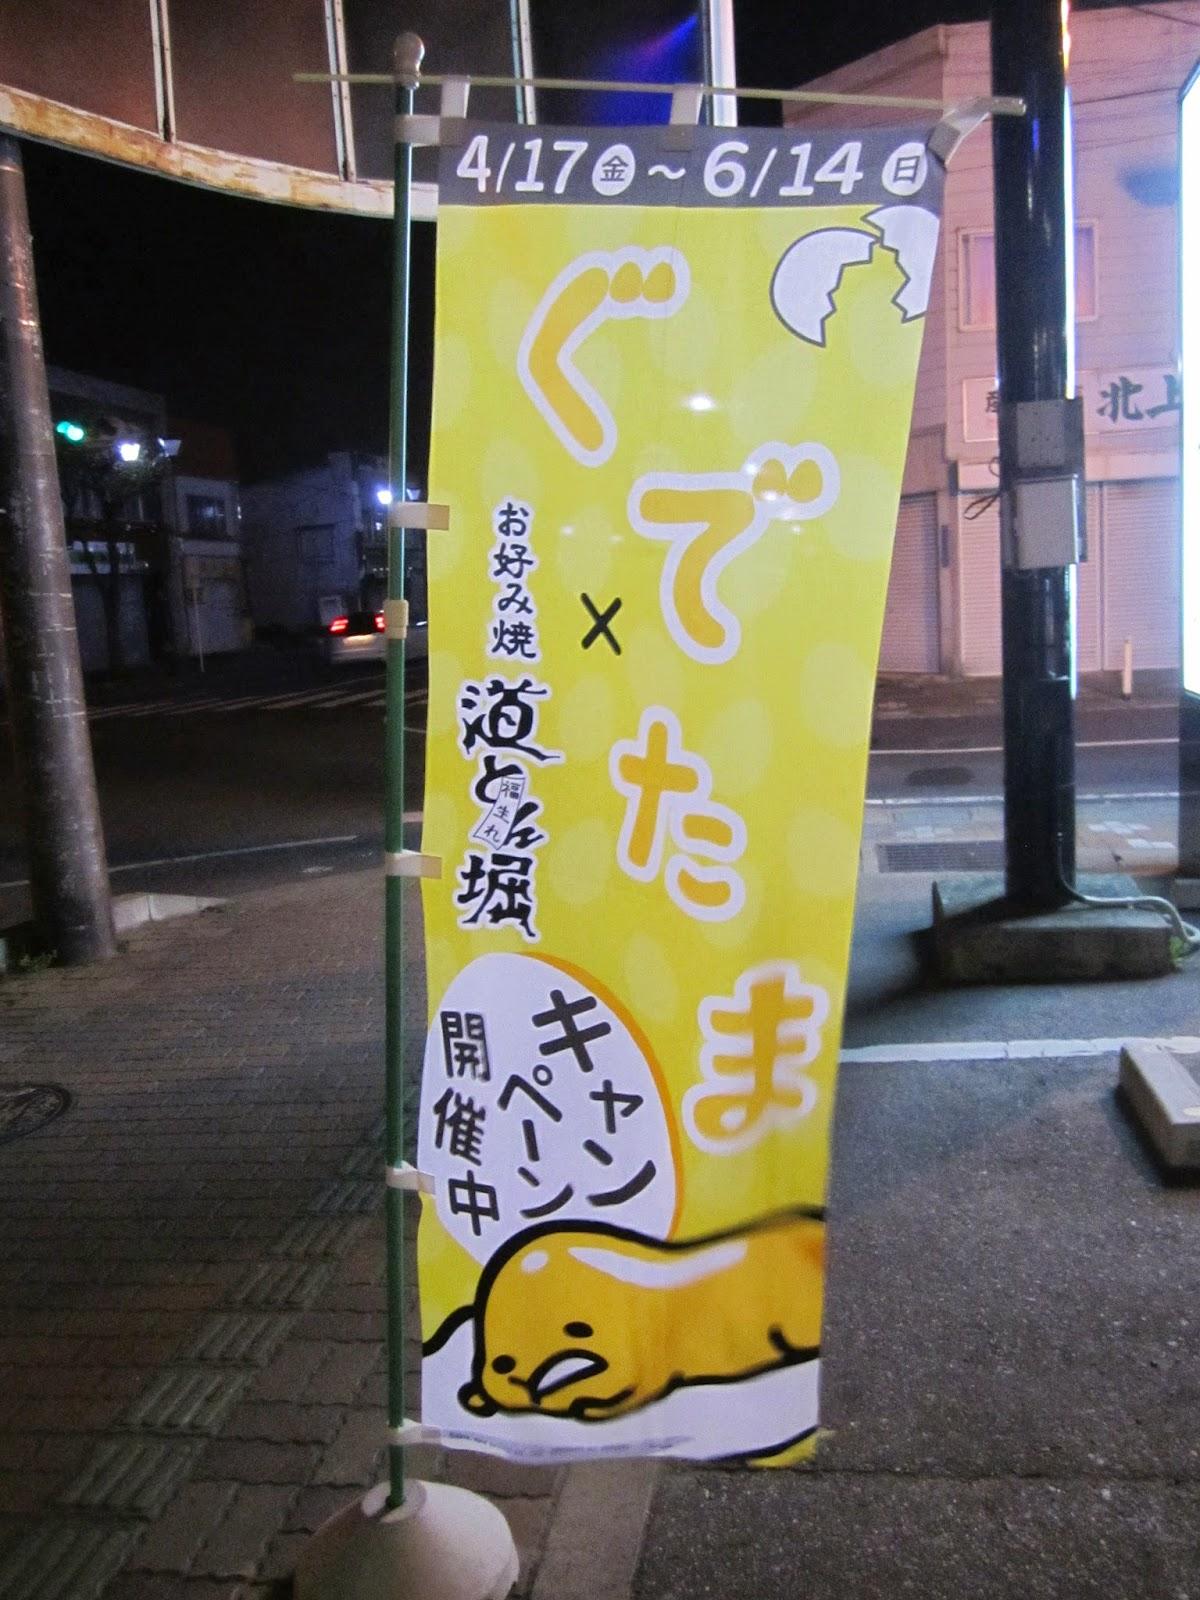 Gudetama x Dohtonbori Collaboration Campaign 十和田市 ぐでたまx道頓堀コラブキャンペイン